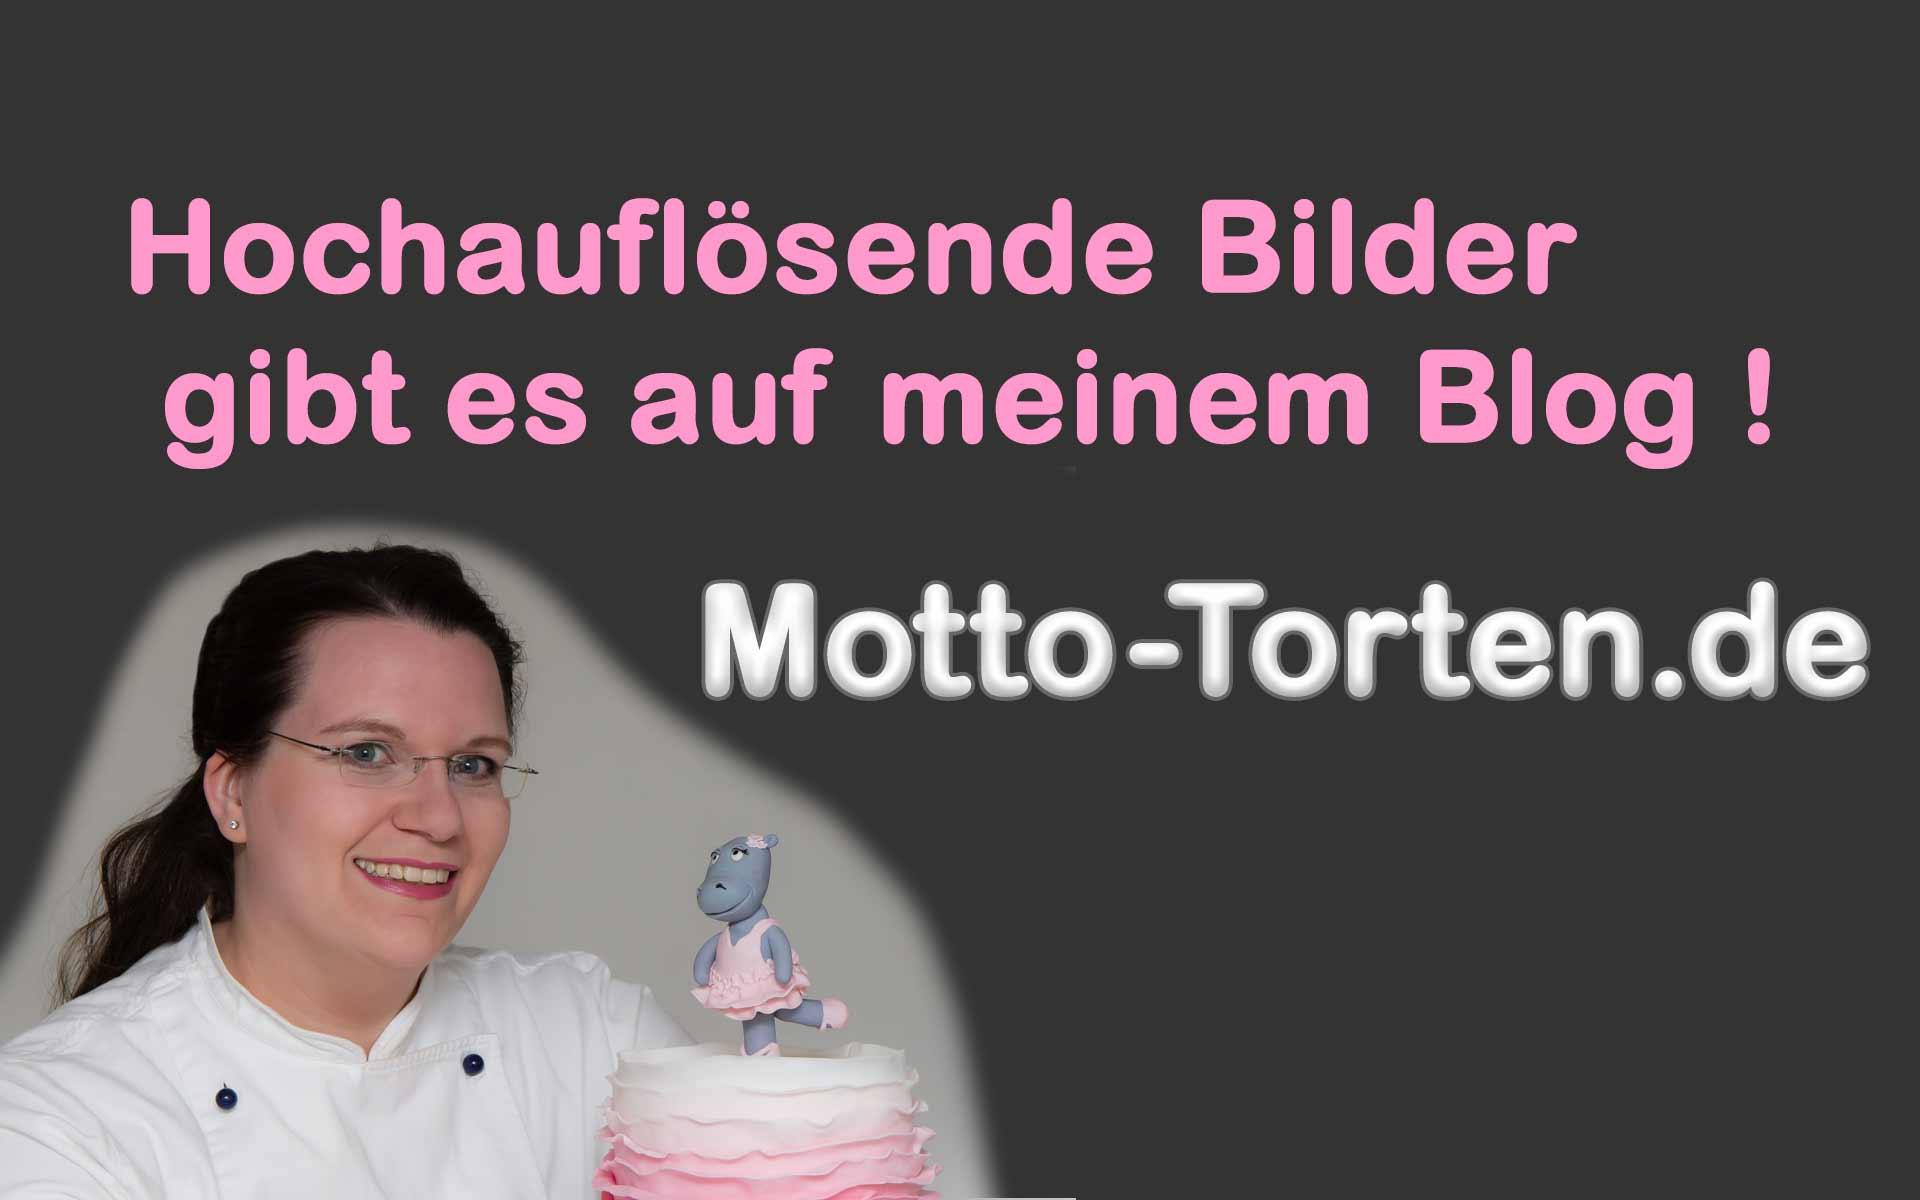 Saustarke Geburtstagstorte  MottoTortende